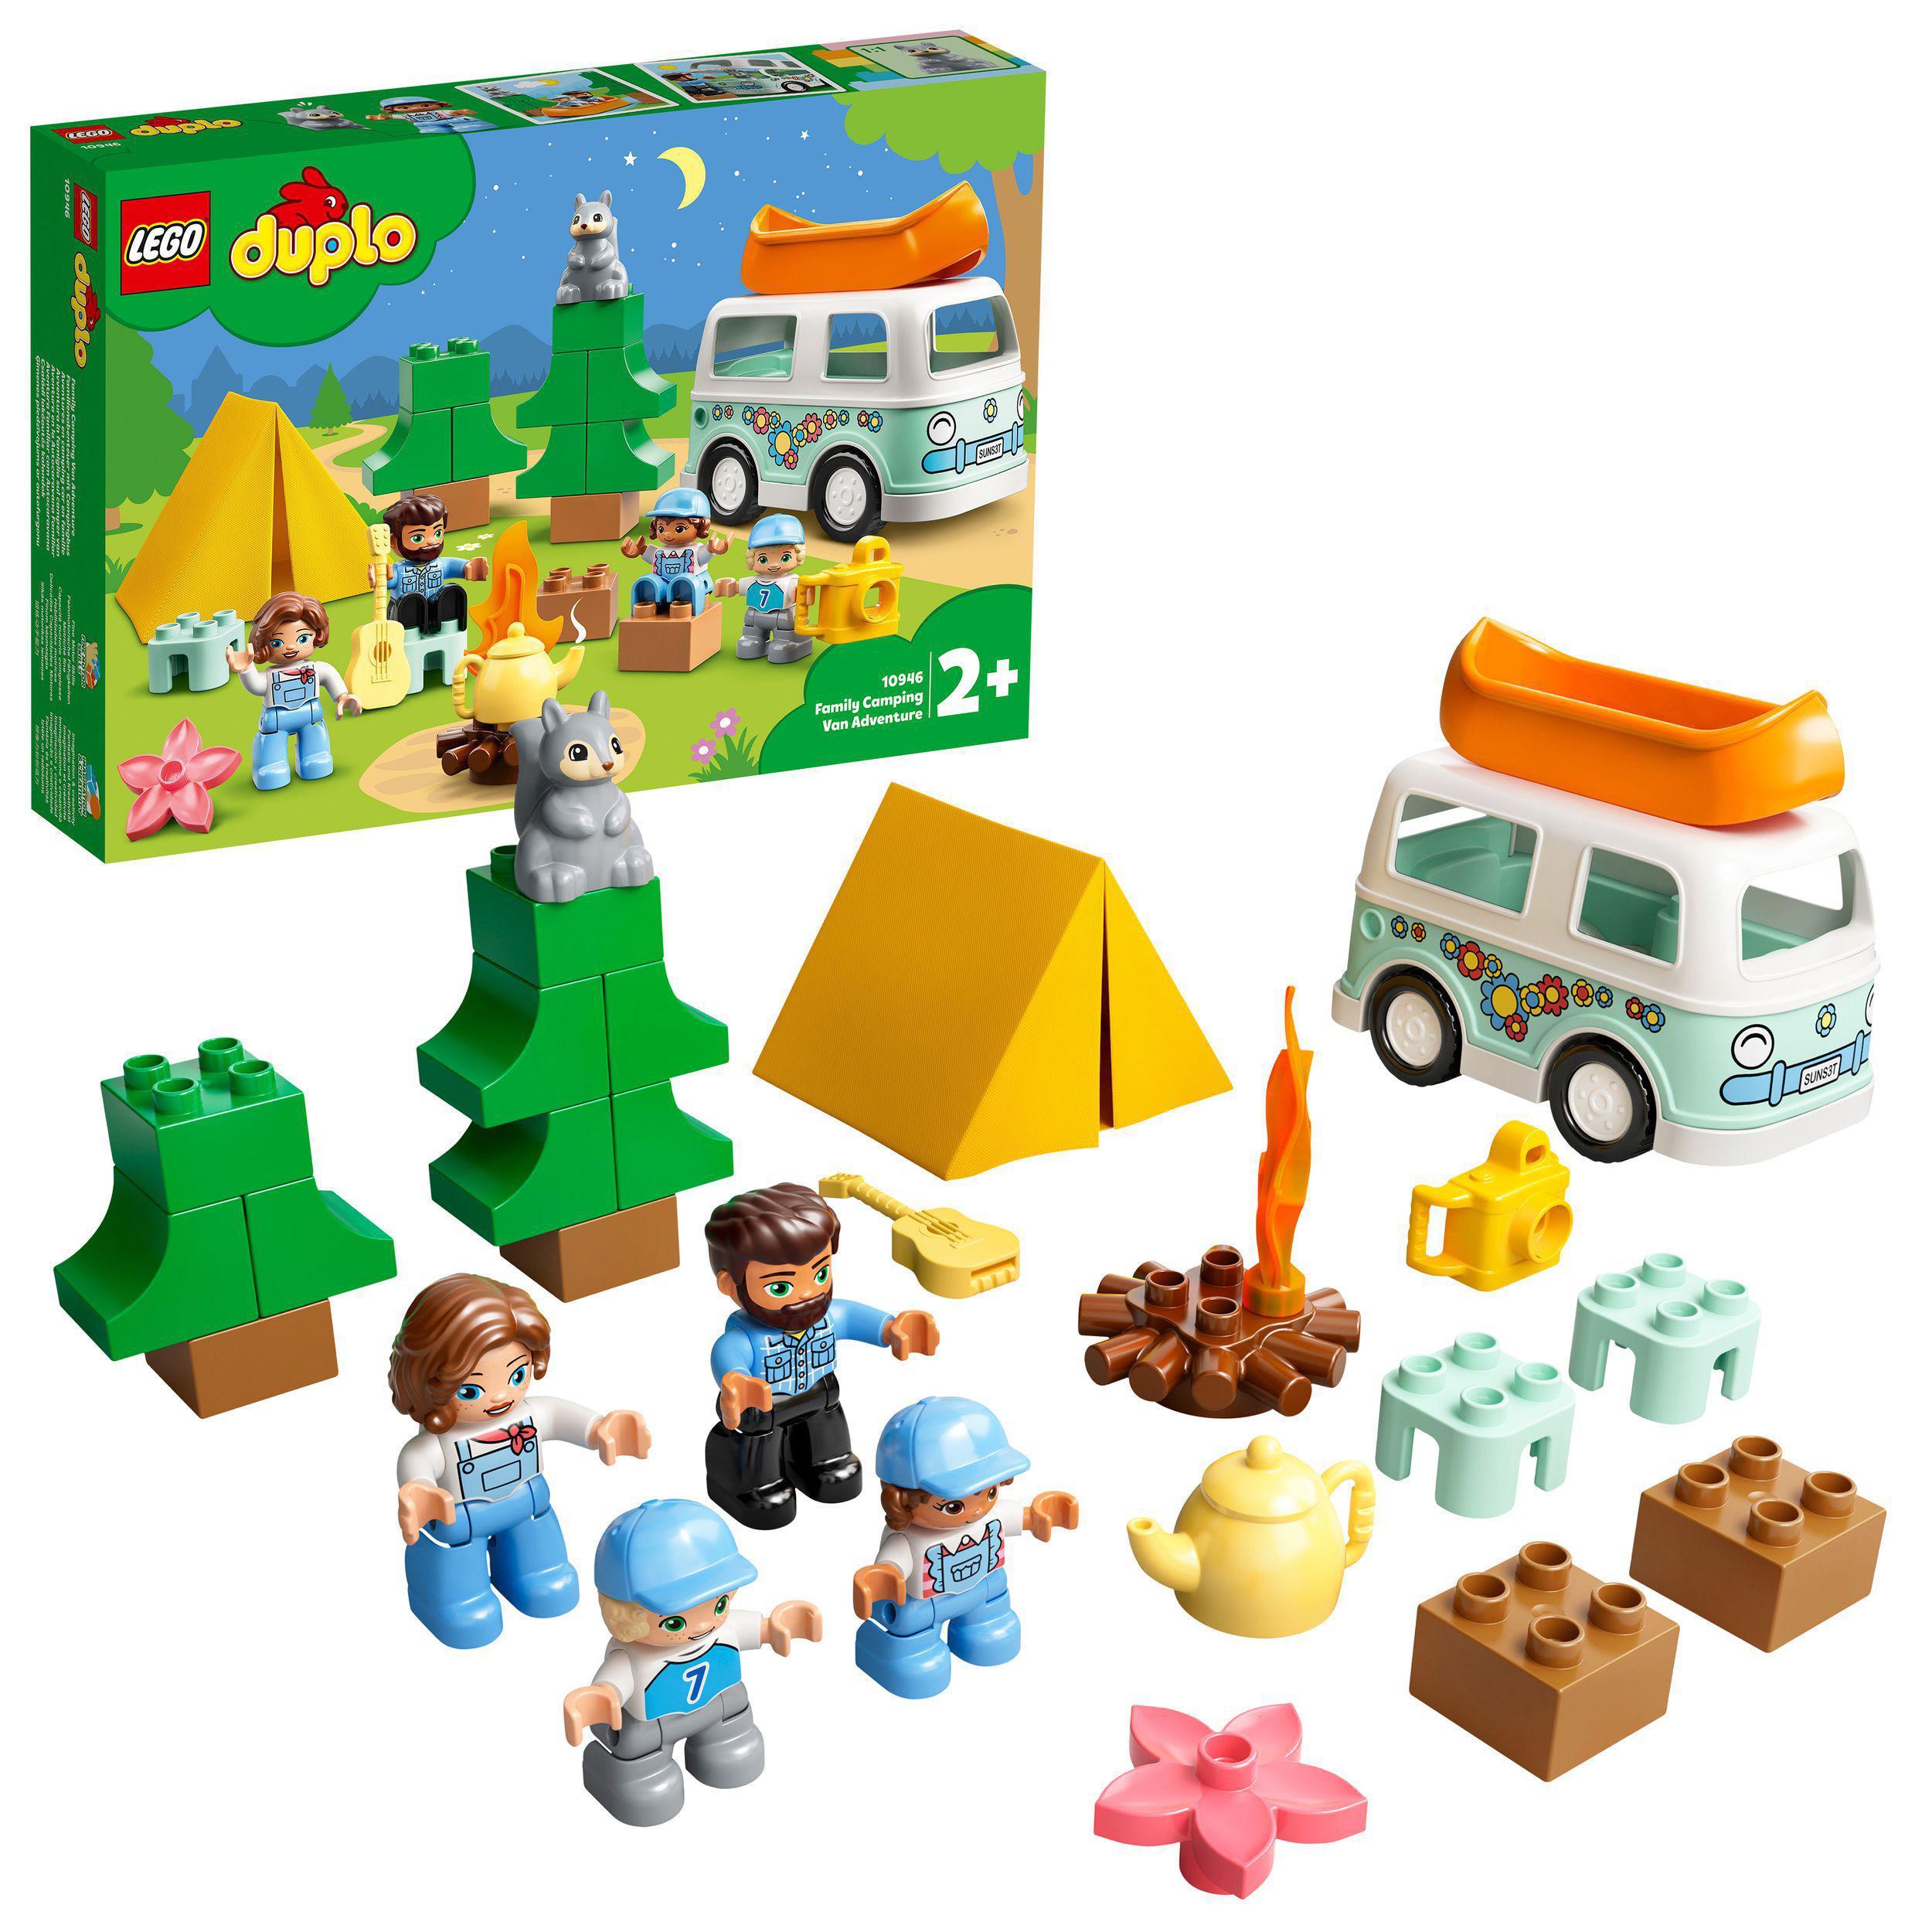 LEGO DUPLO - Family Camping Van Adventure (10946)